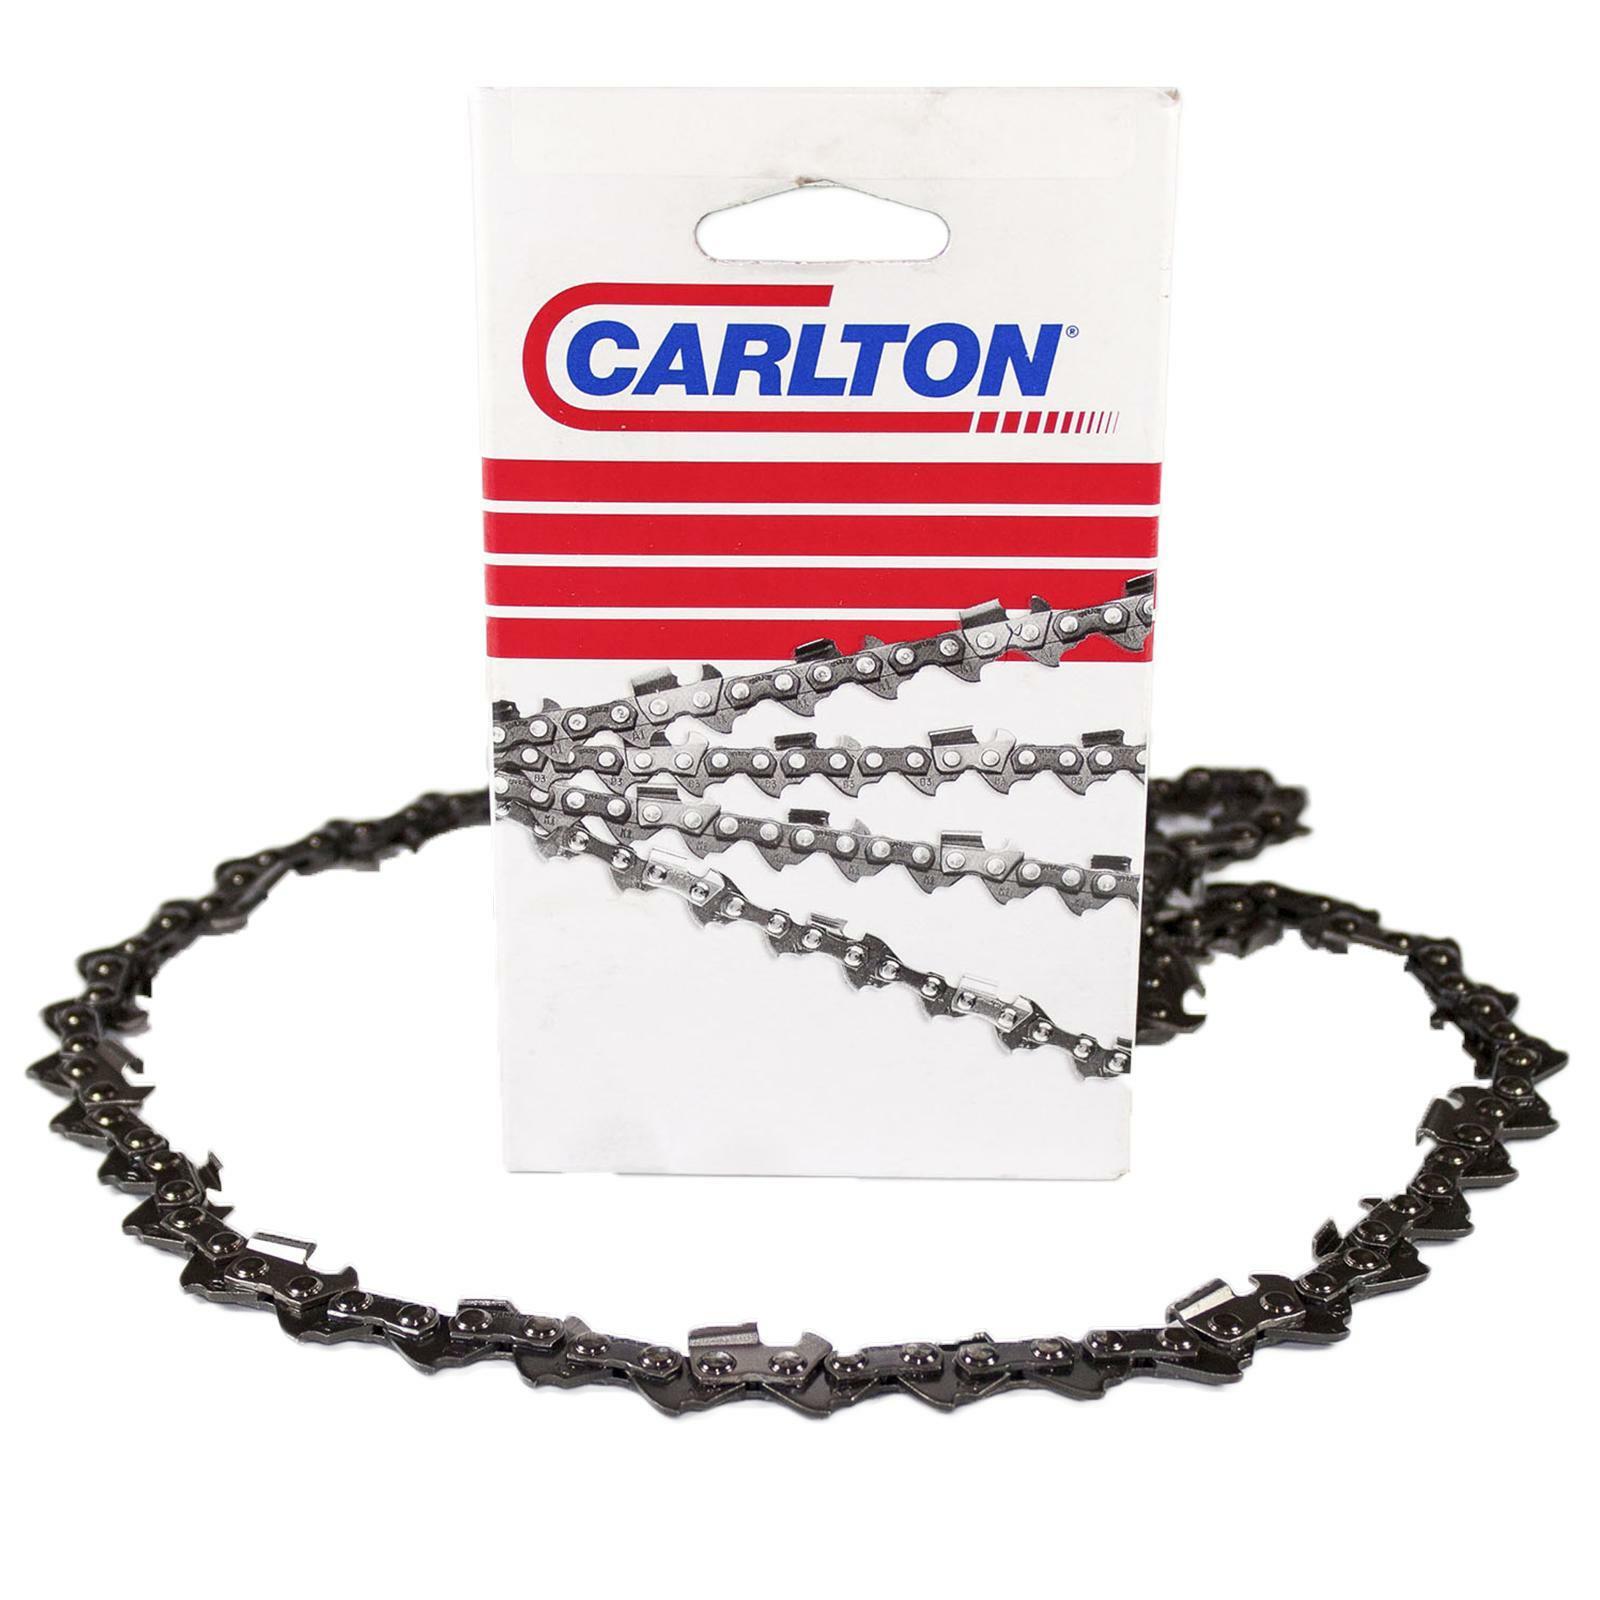 carlton catena per motosega carlton 3/8 sp 1.3 cm30 44 maglie